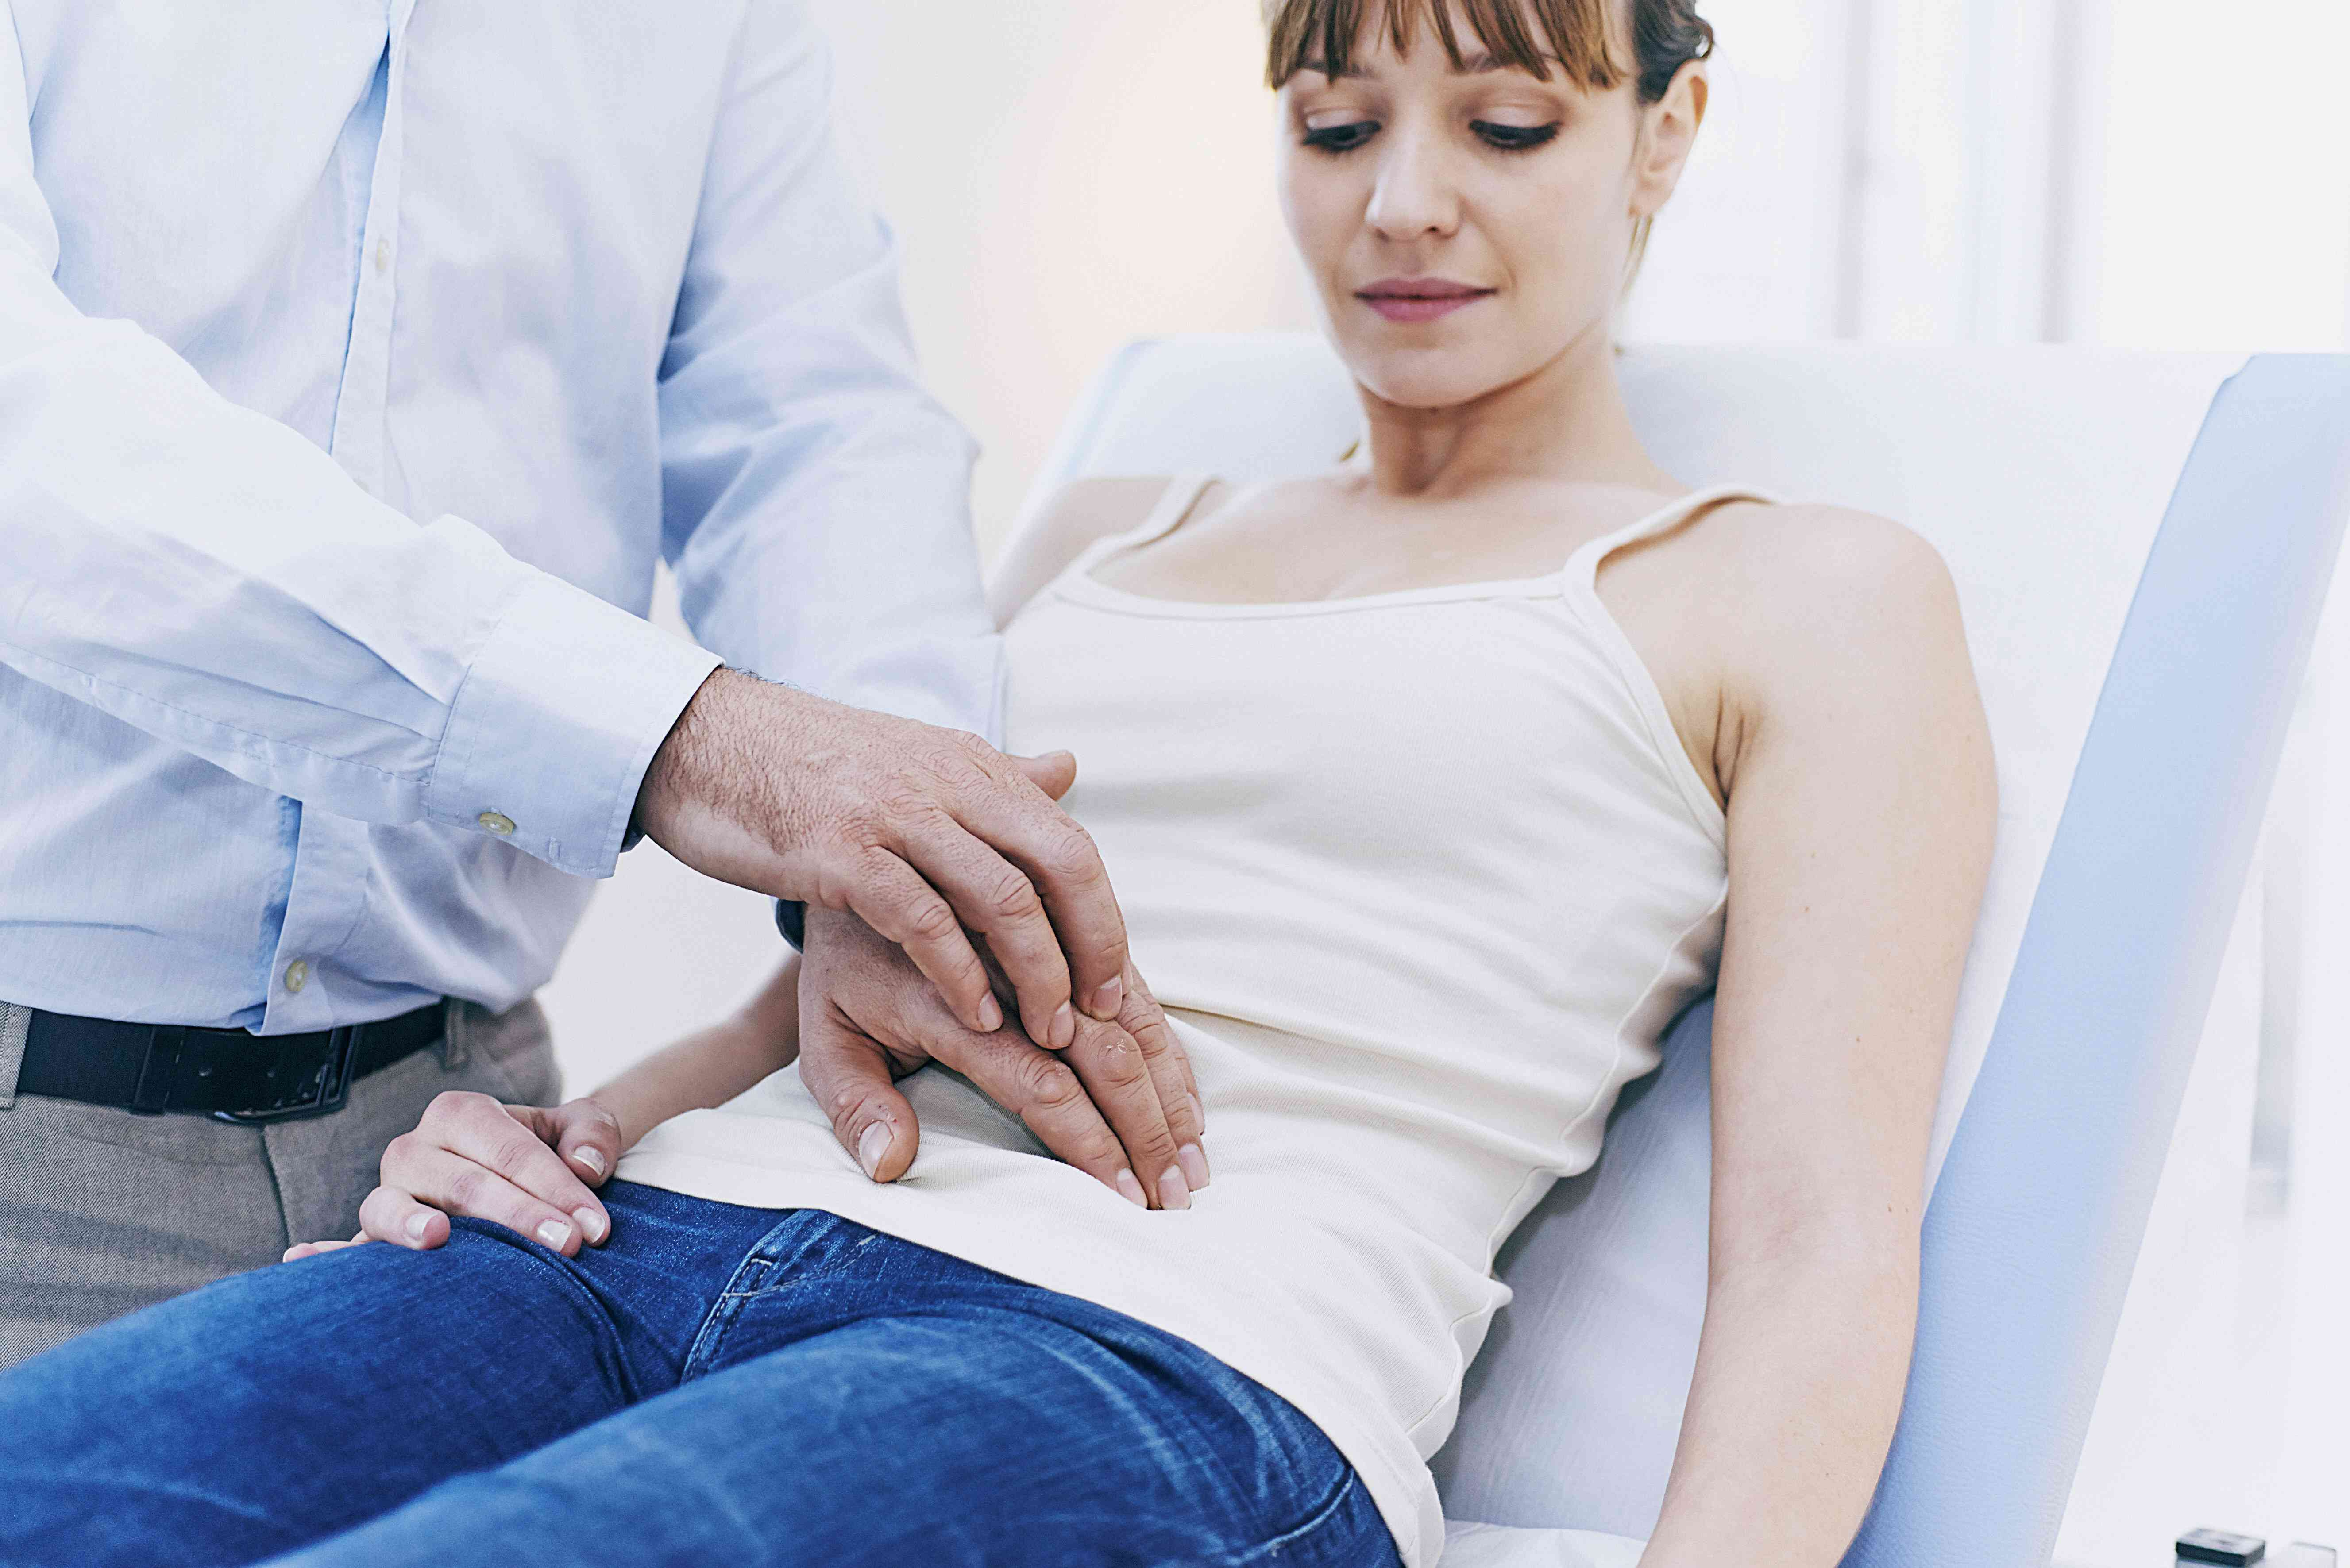 doctor examining abdomen of a patient